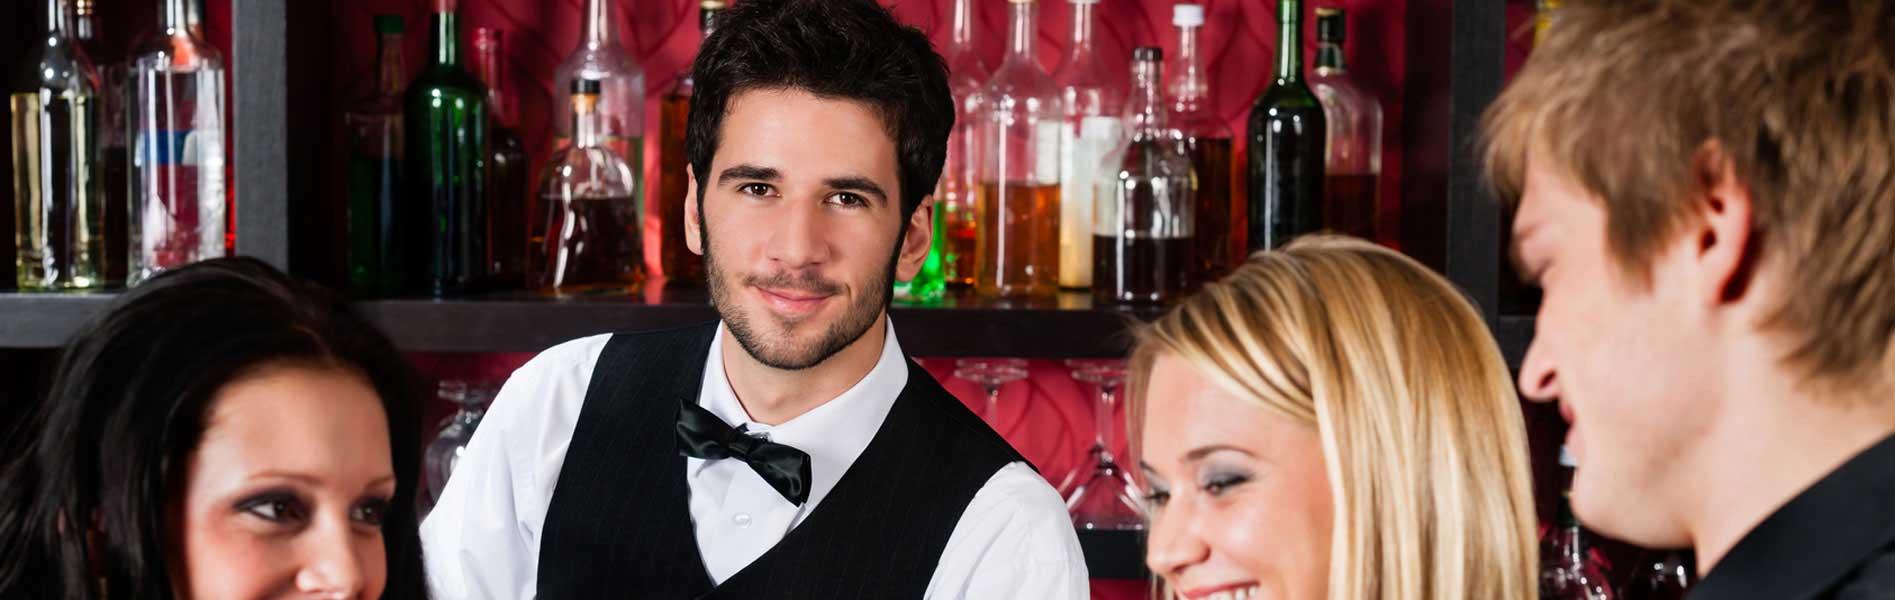 Barkeeper München - Unikorn Catering & Events